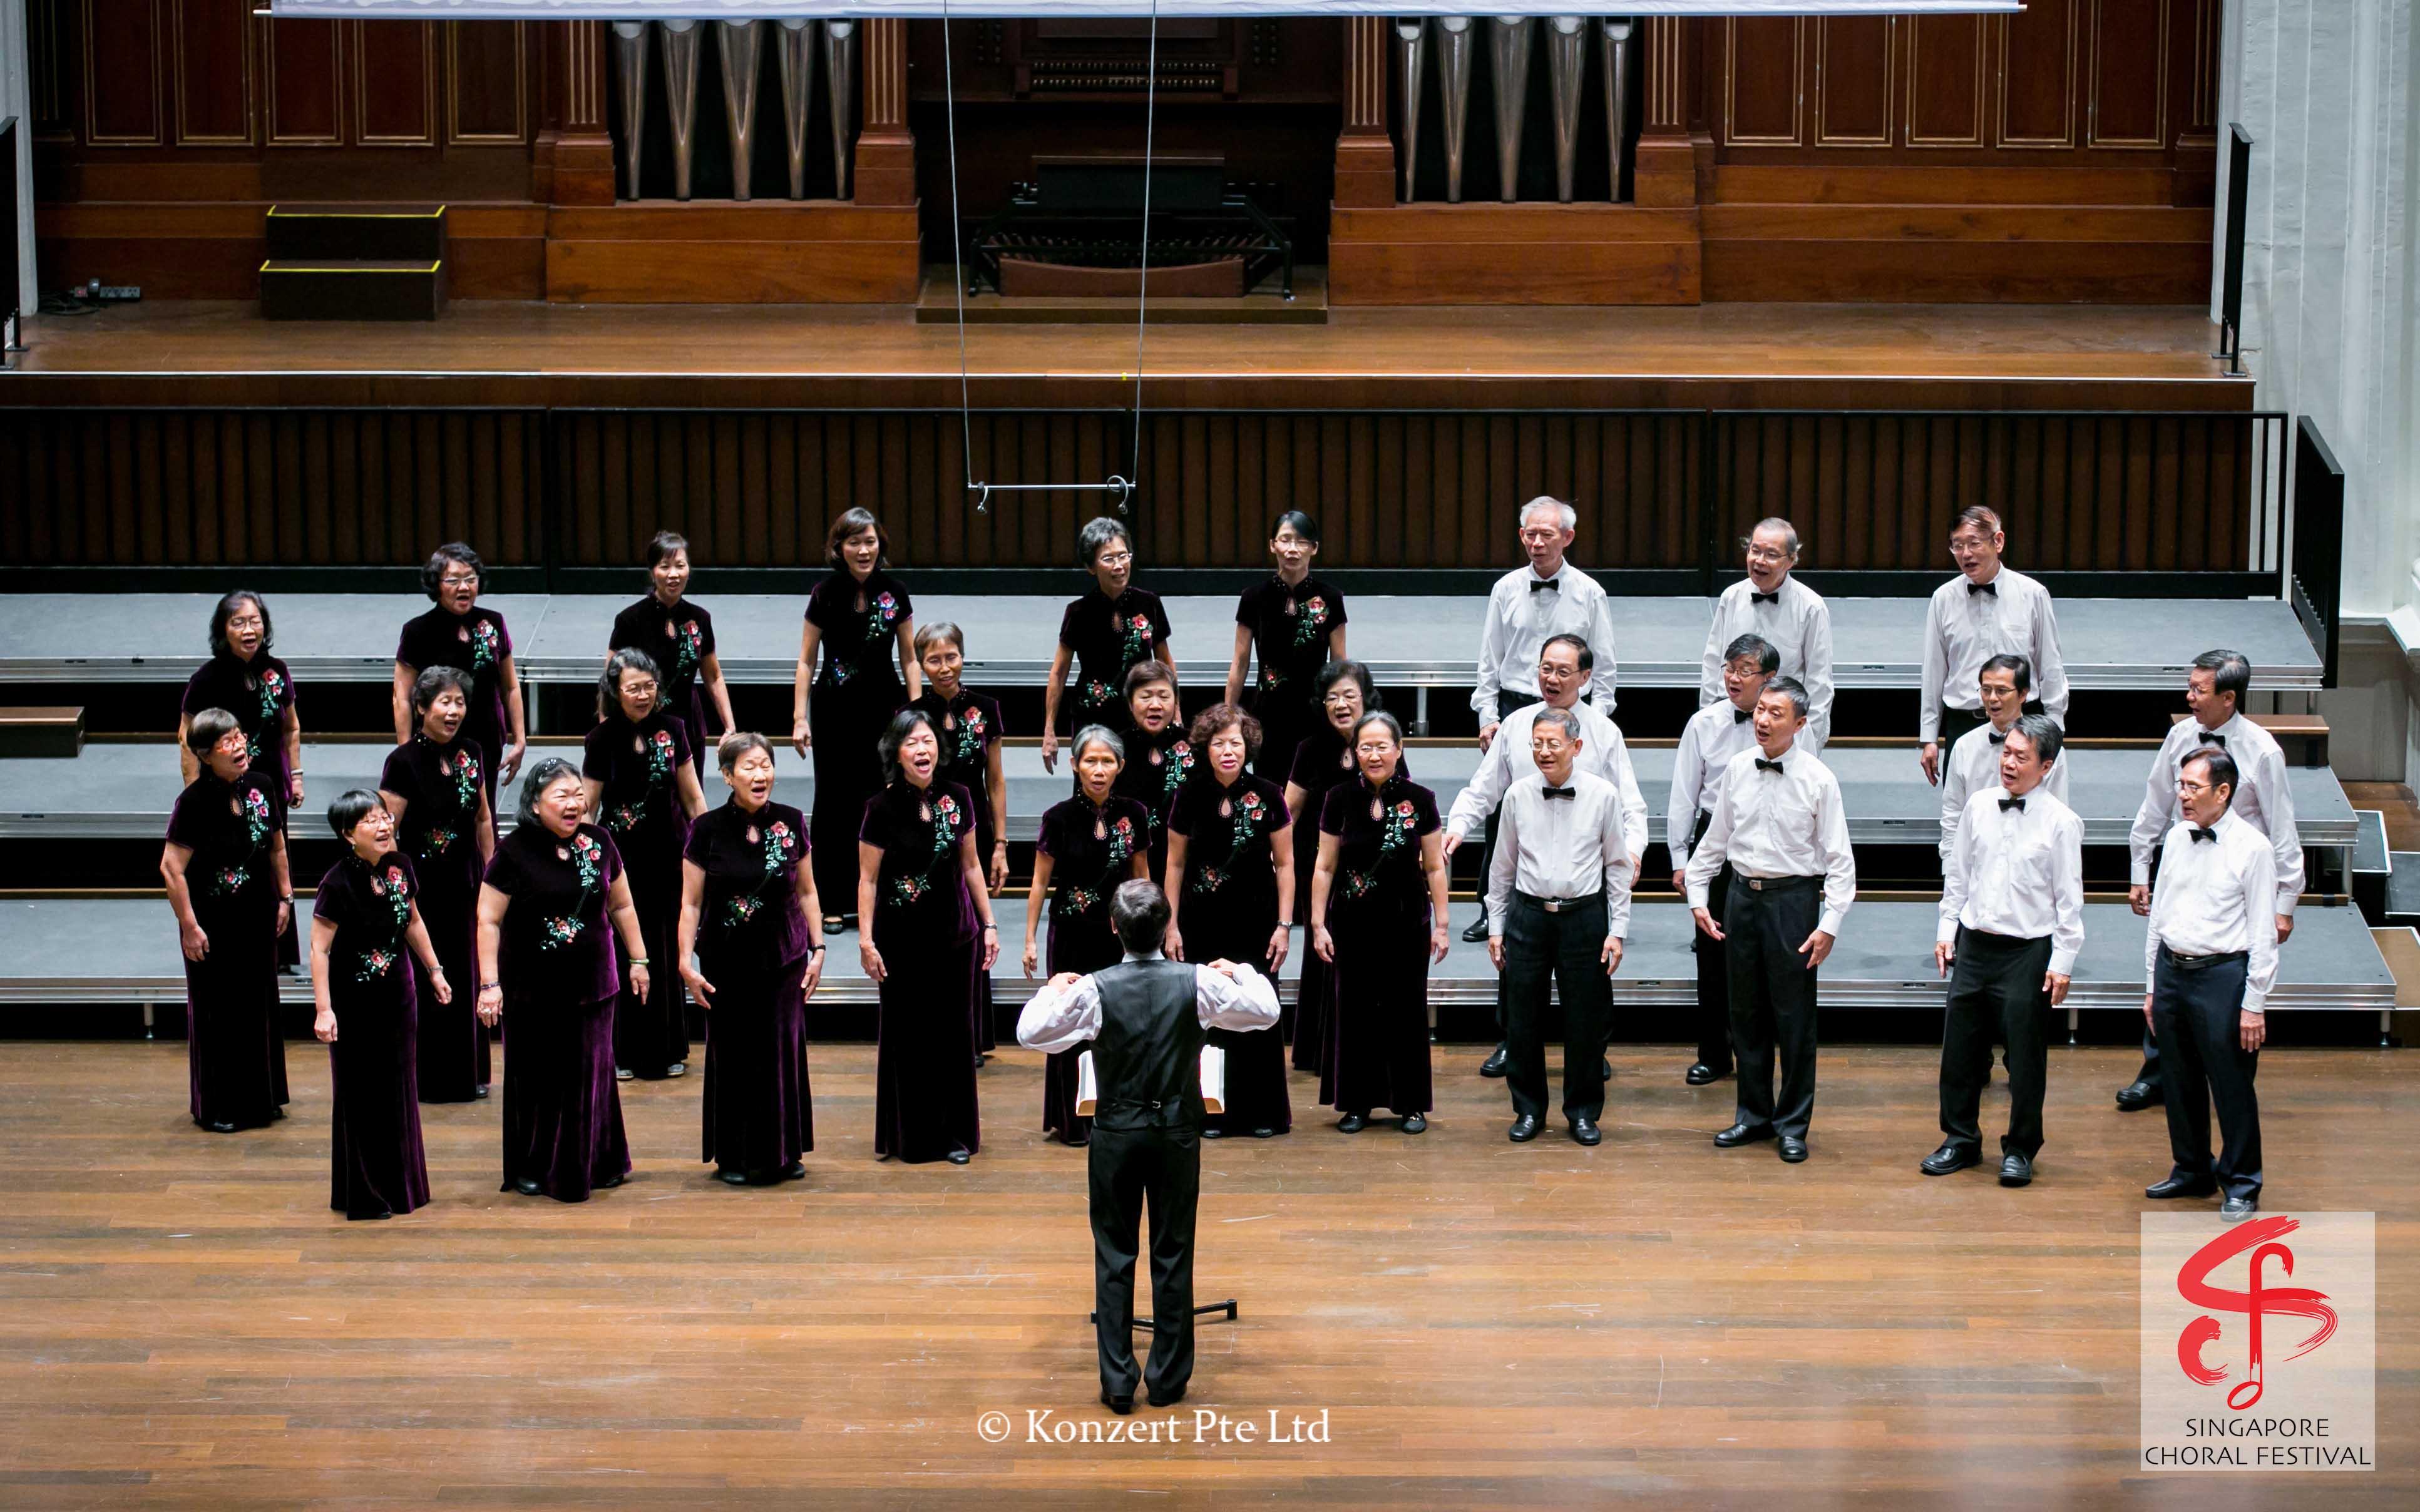 Singapore Choral Festival 8-8-15 (200).jpg